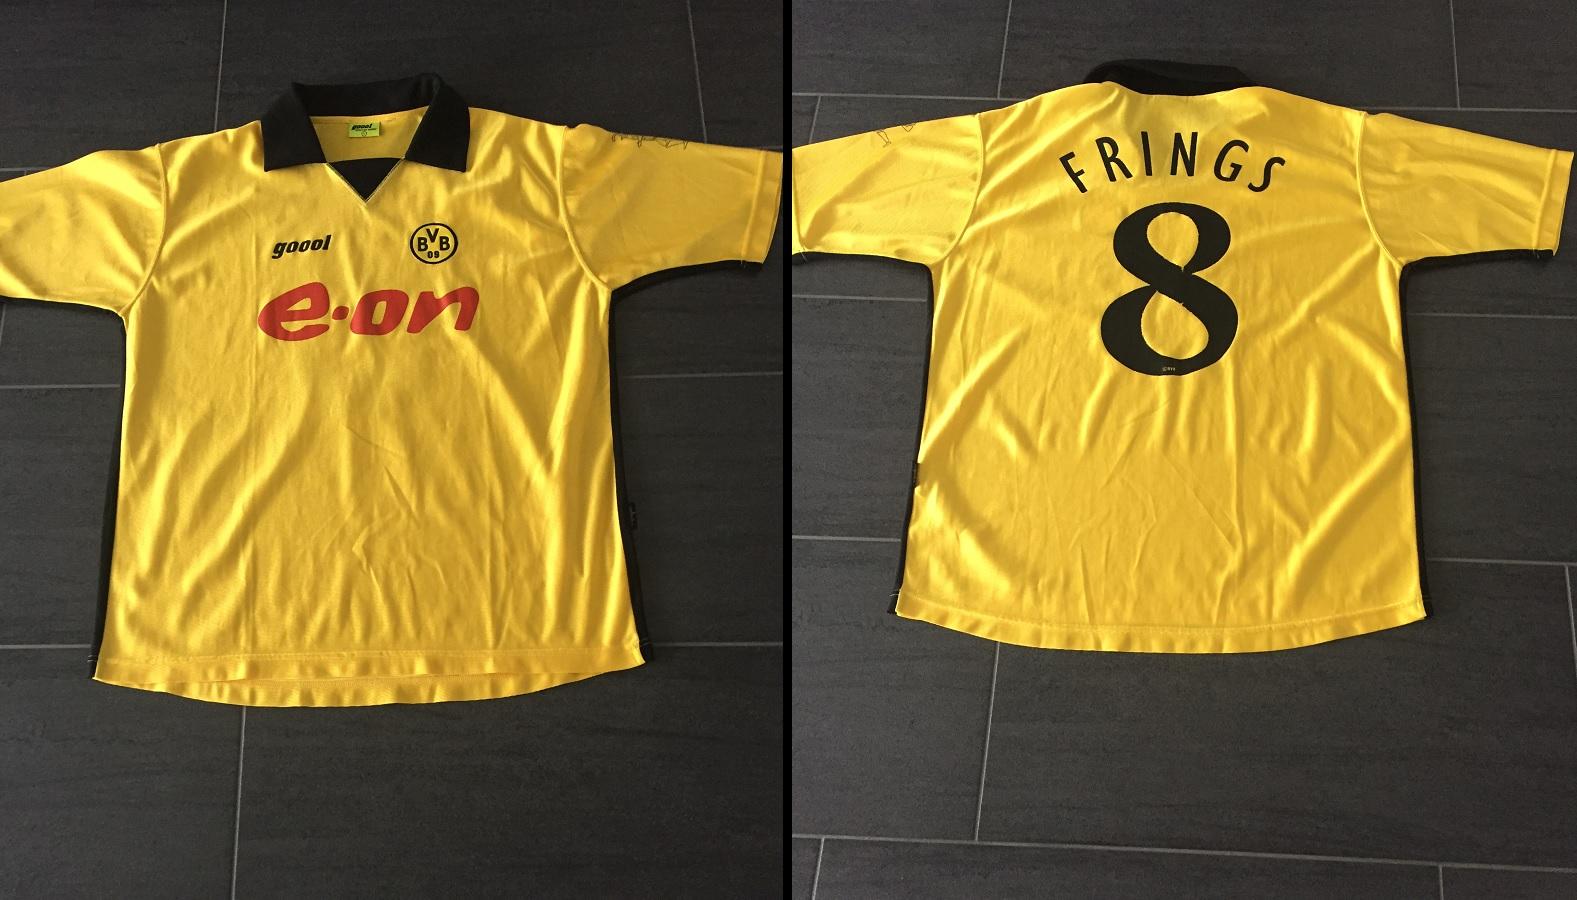 Borussia Dortmund X-mas 2003/04 Frings